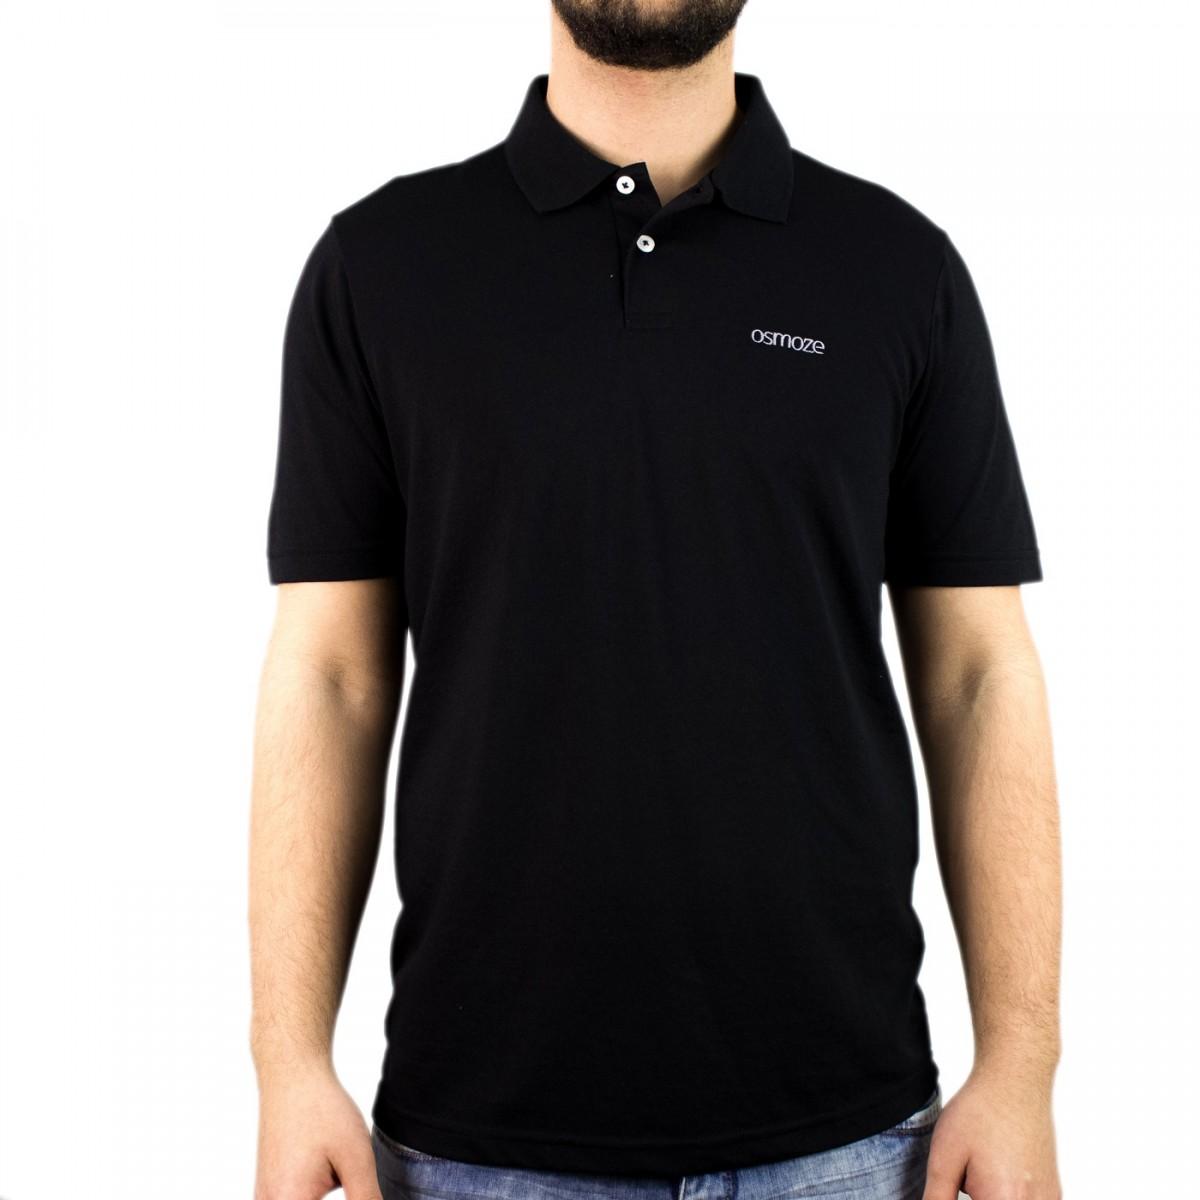 c35323b96c Bizz Store - Camisa Polo Masculina Osmoze Manga Curta Preta